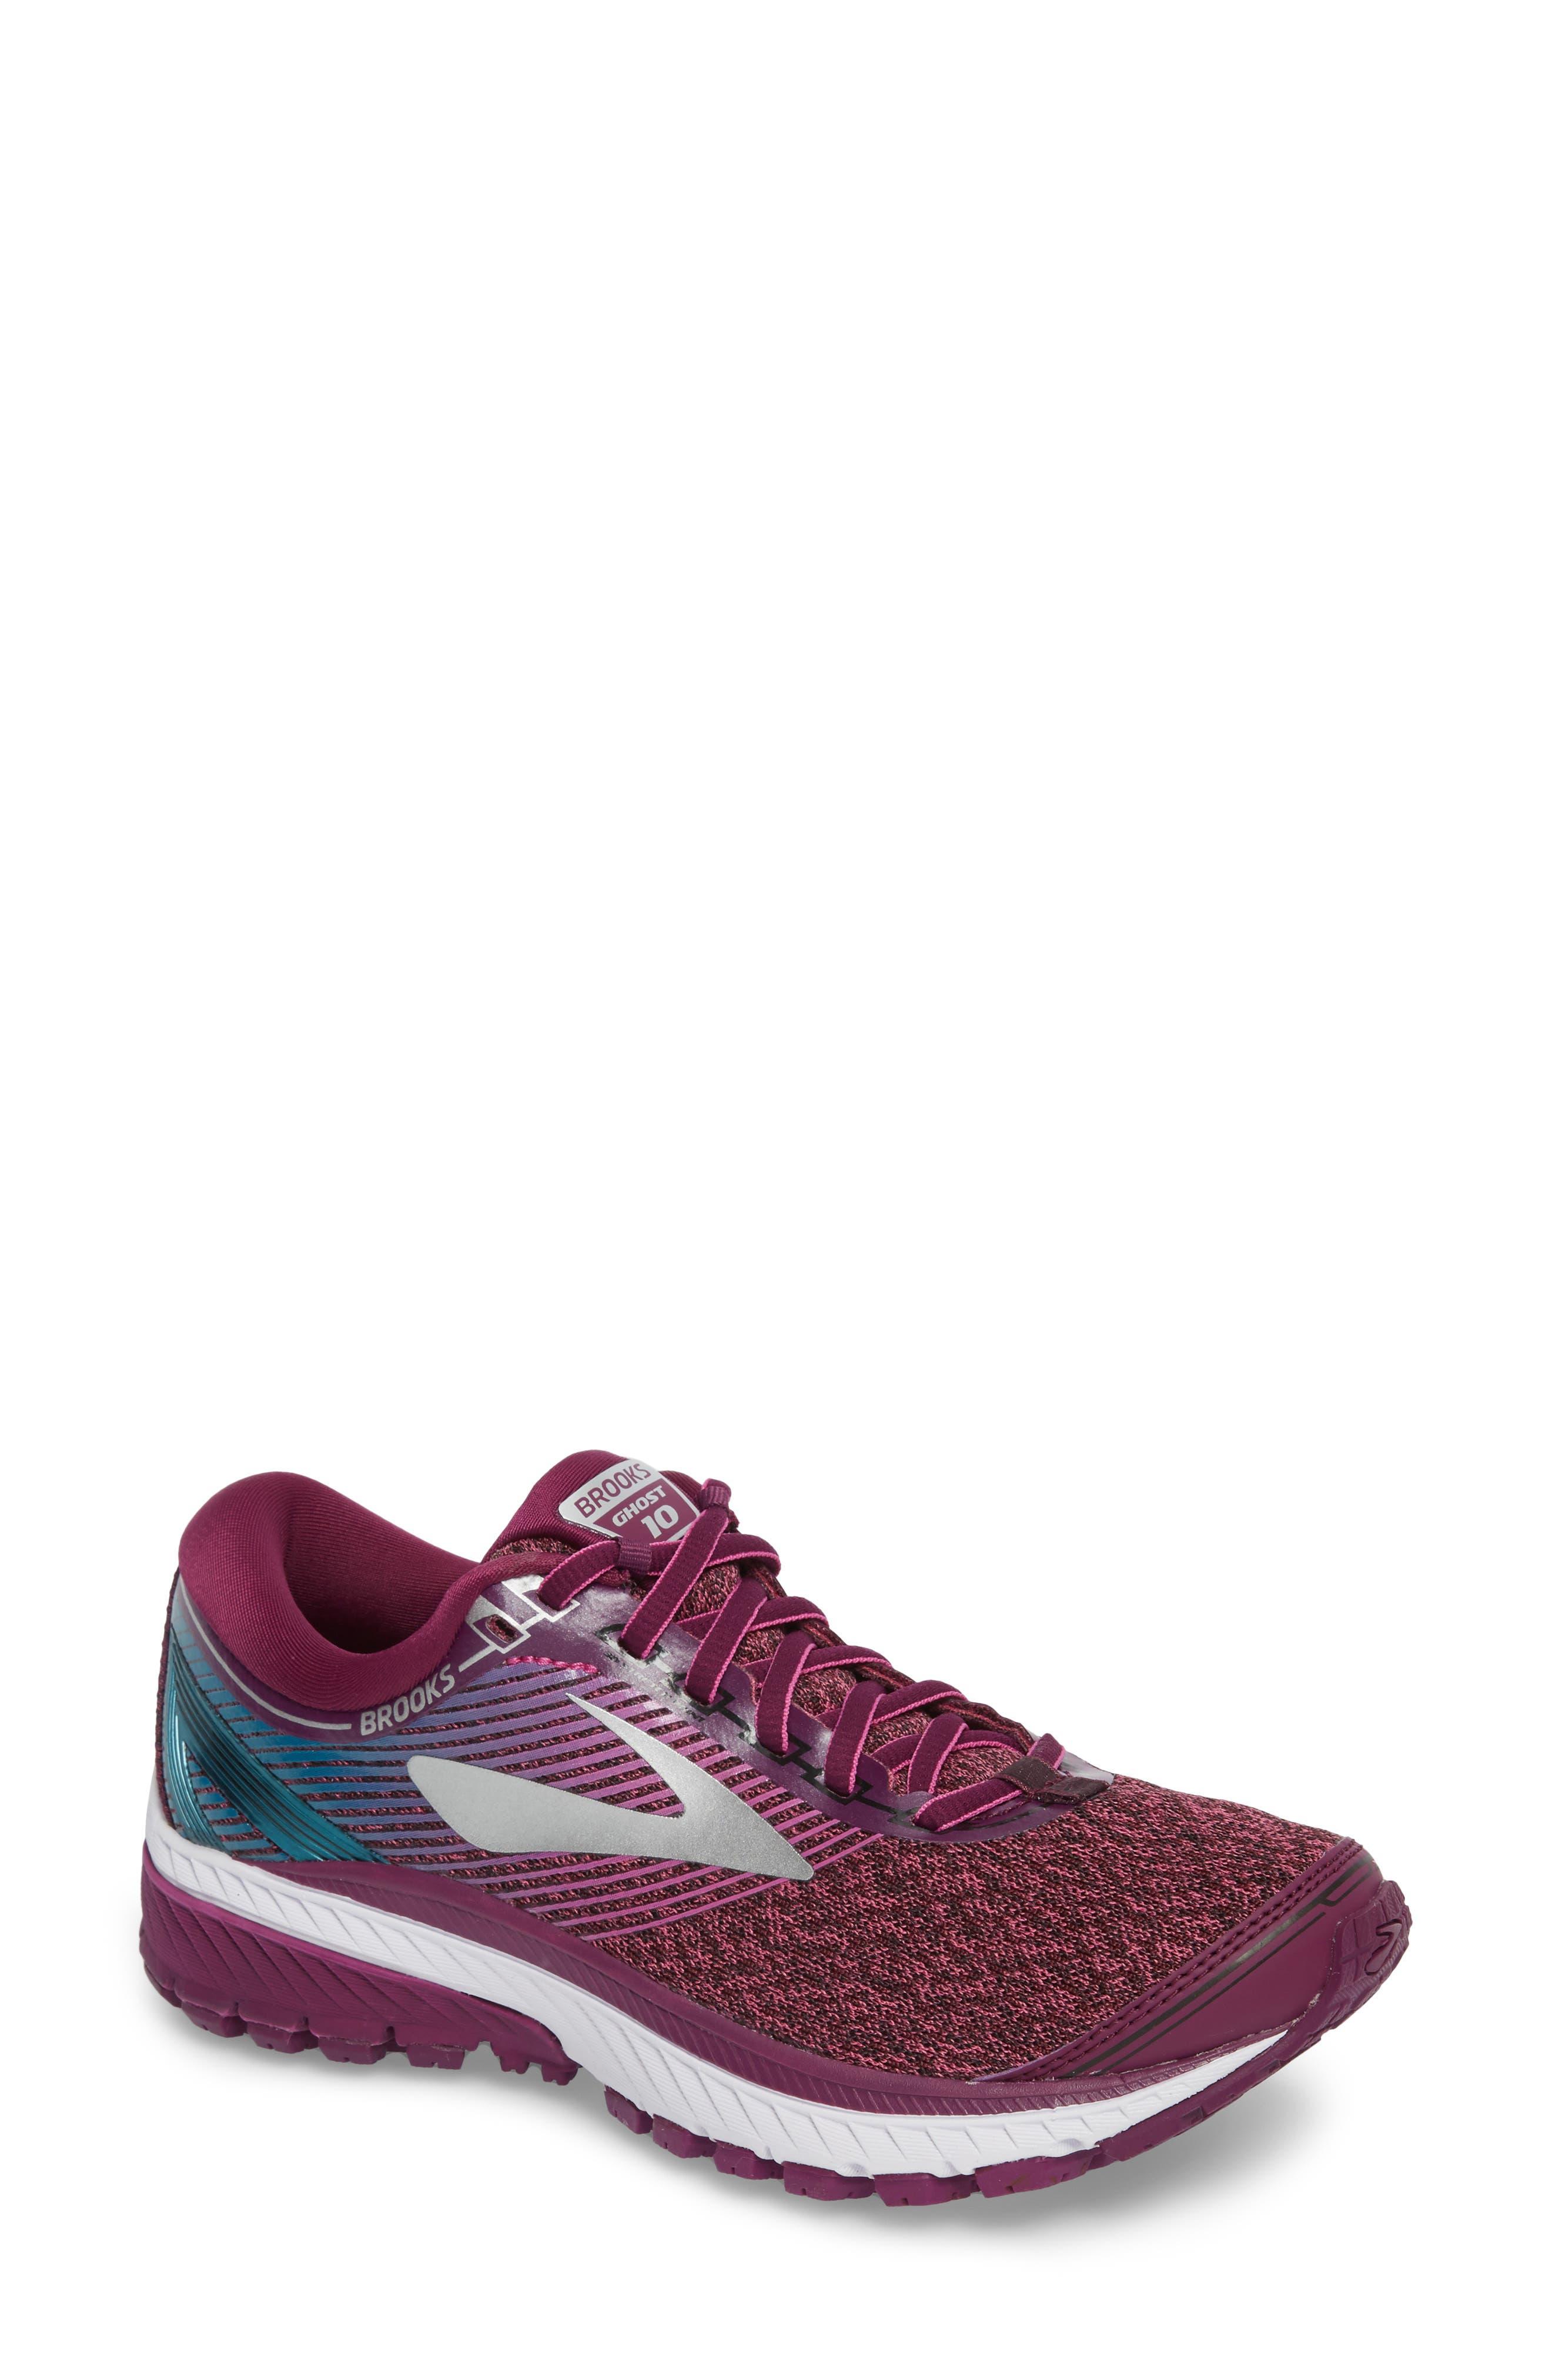 Alternate Image 1 Selected - Brooks Ghost 10 Running Shoe (Women)